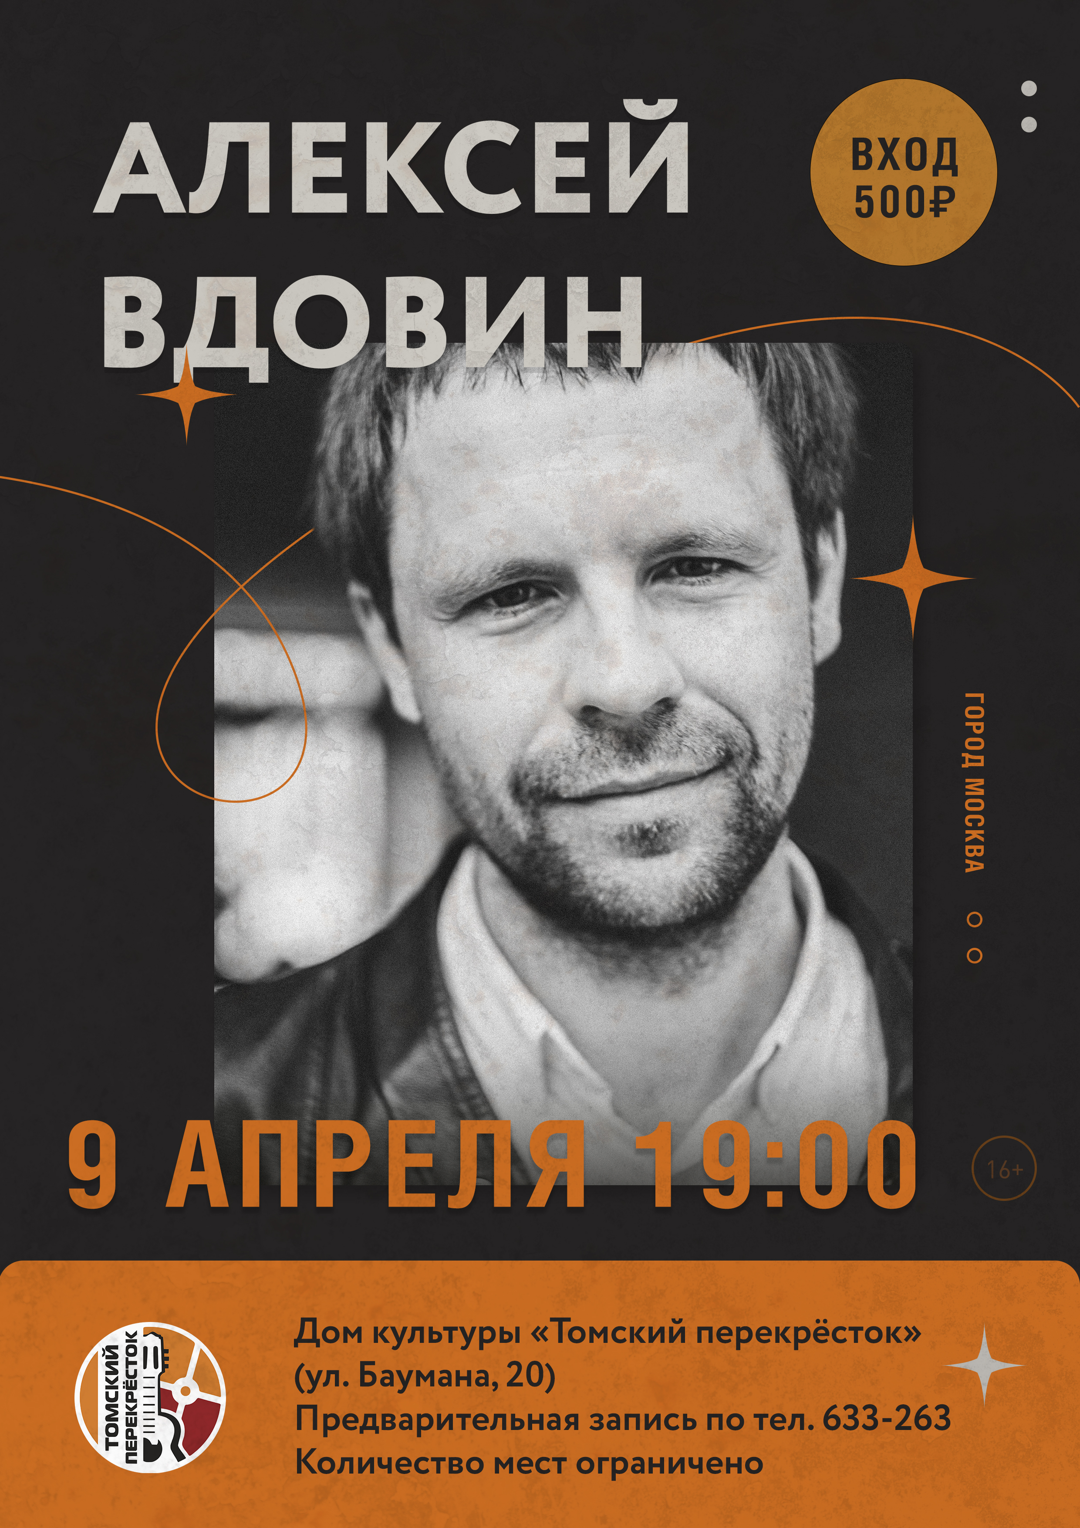 афиша Алексей Вдовин